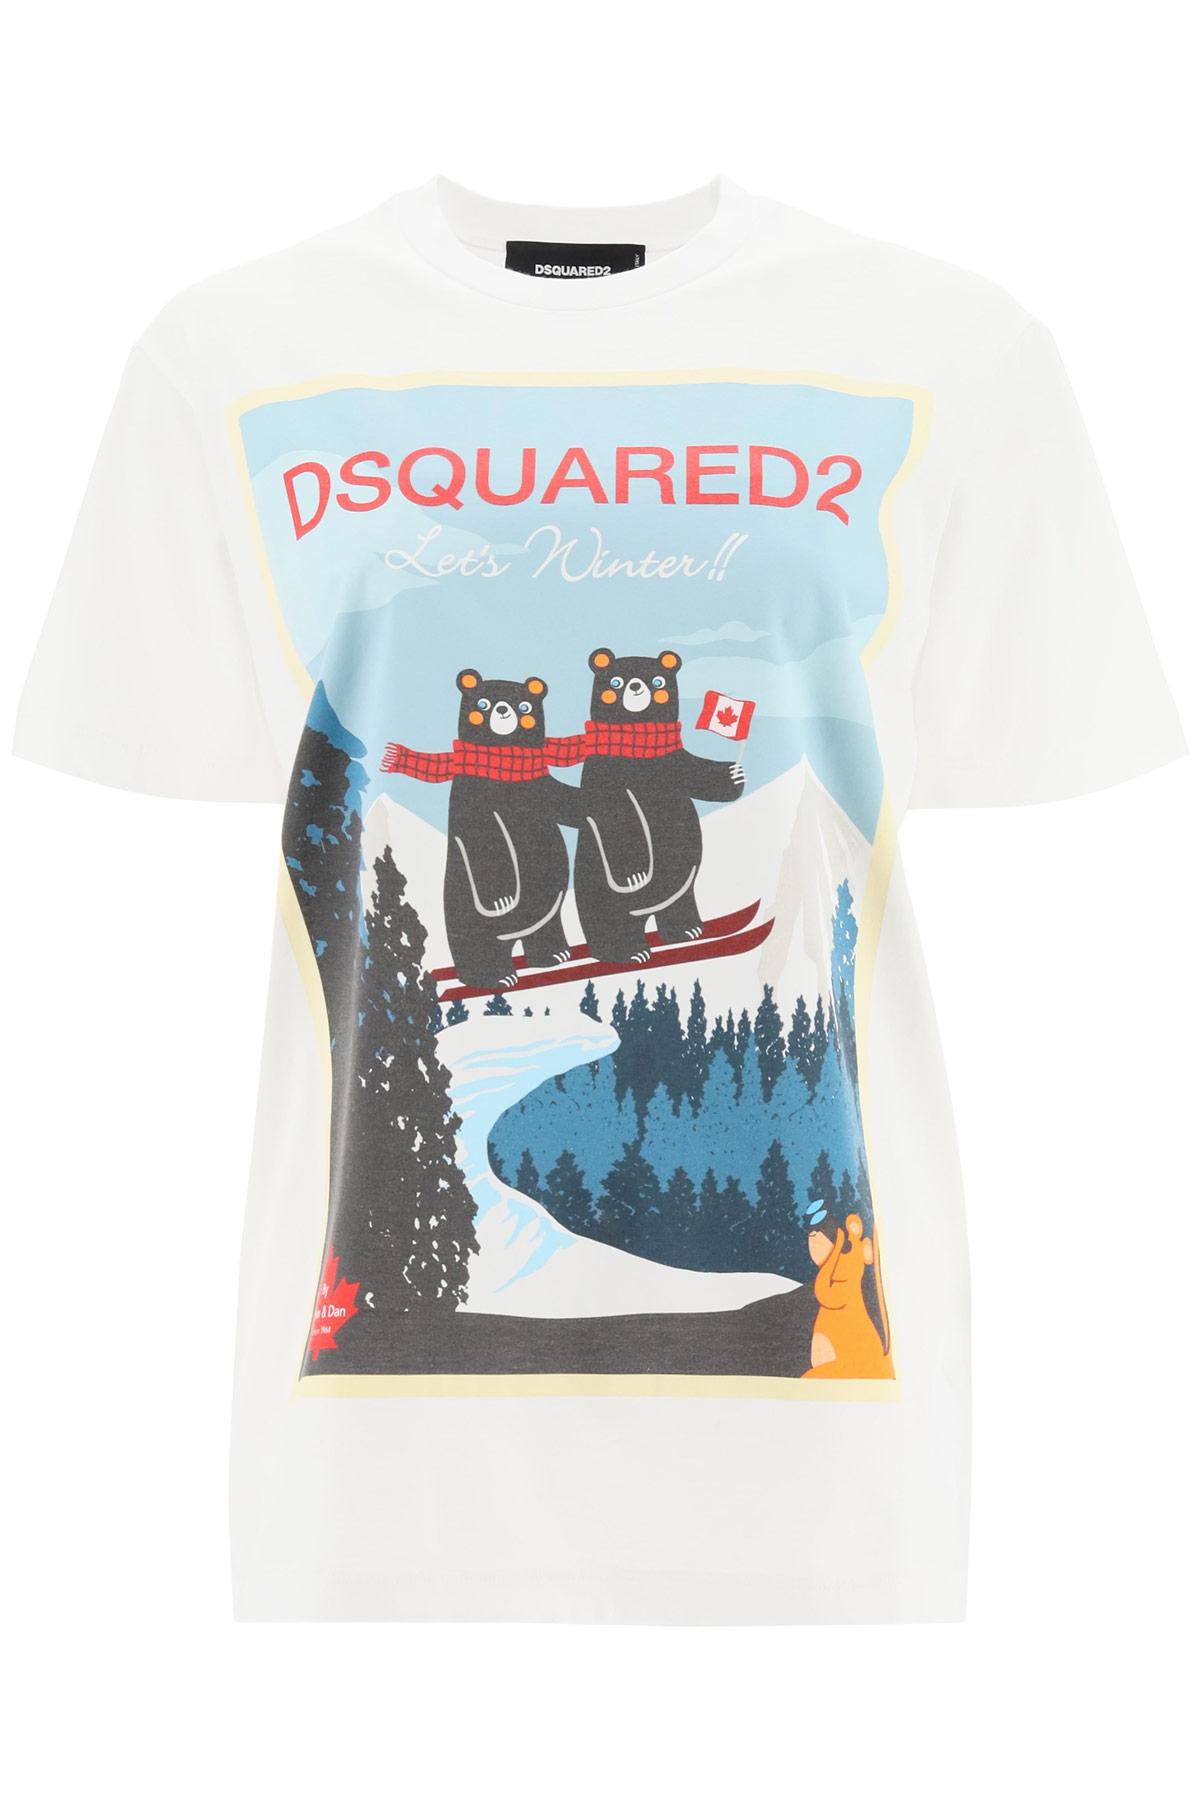 DSQUARED2 POLAR BEARS PRINT T-SHIRT S White, Light blue, Red Cotton